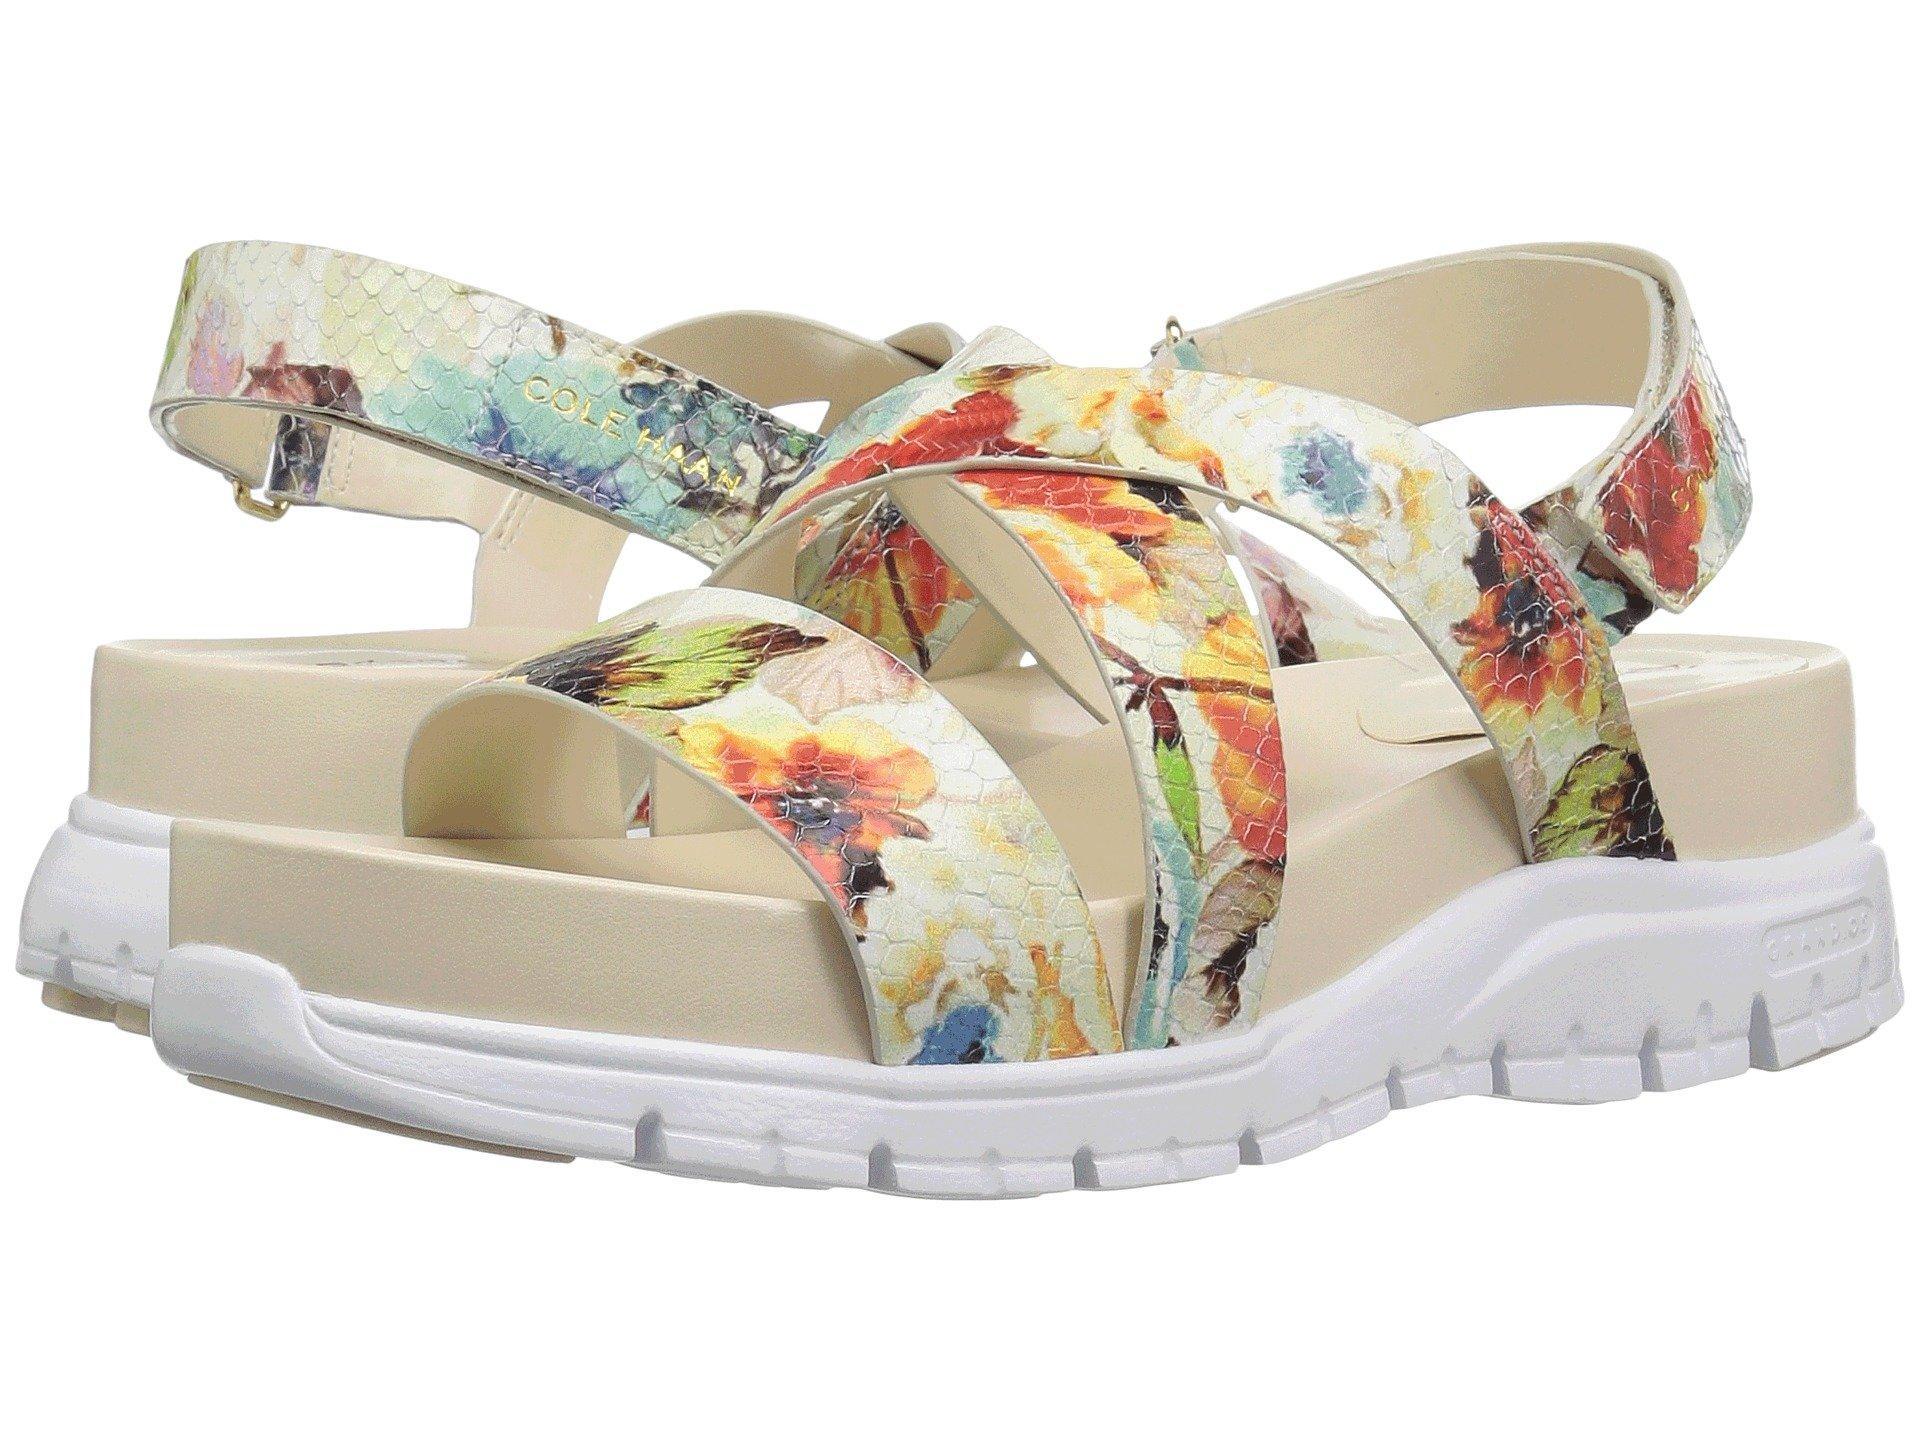 7c6e818e5 Cole Haan Zerogrand Crisscross Sandal (Bds) In Floral Print Optic White